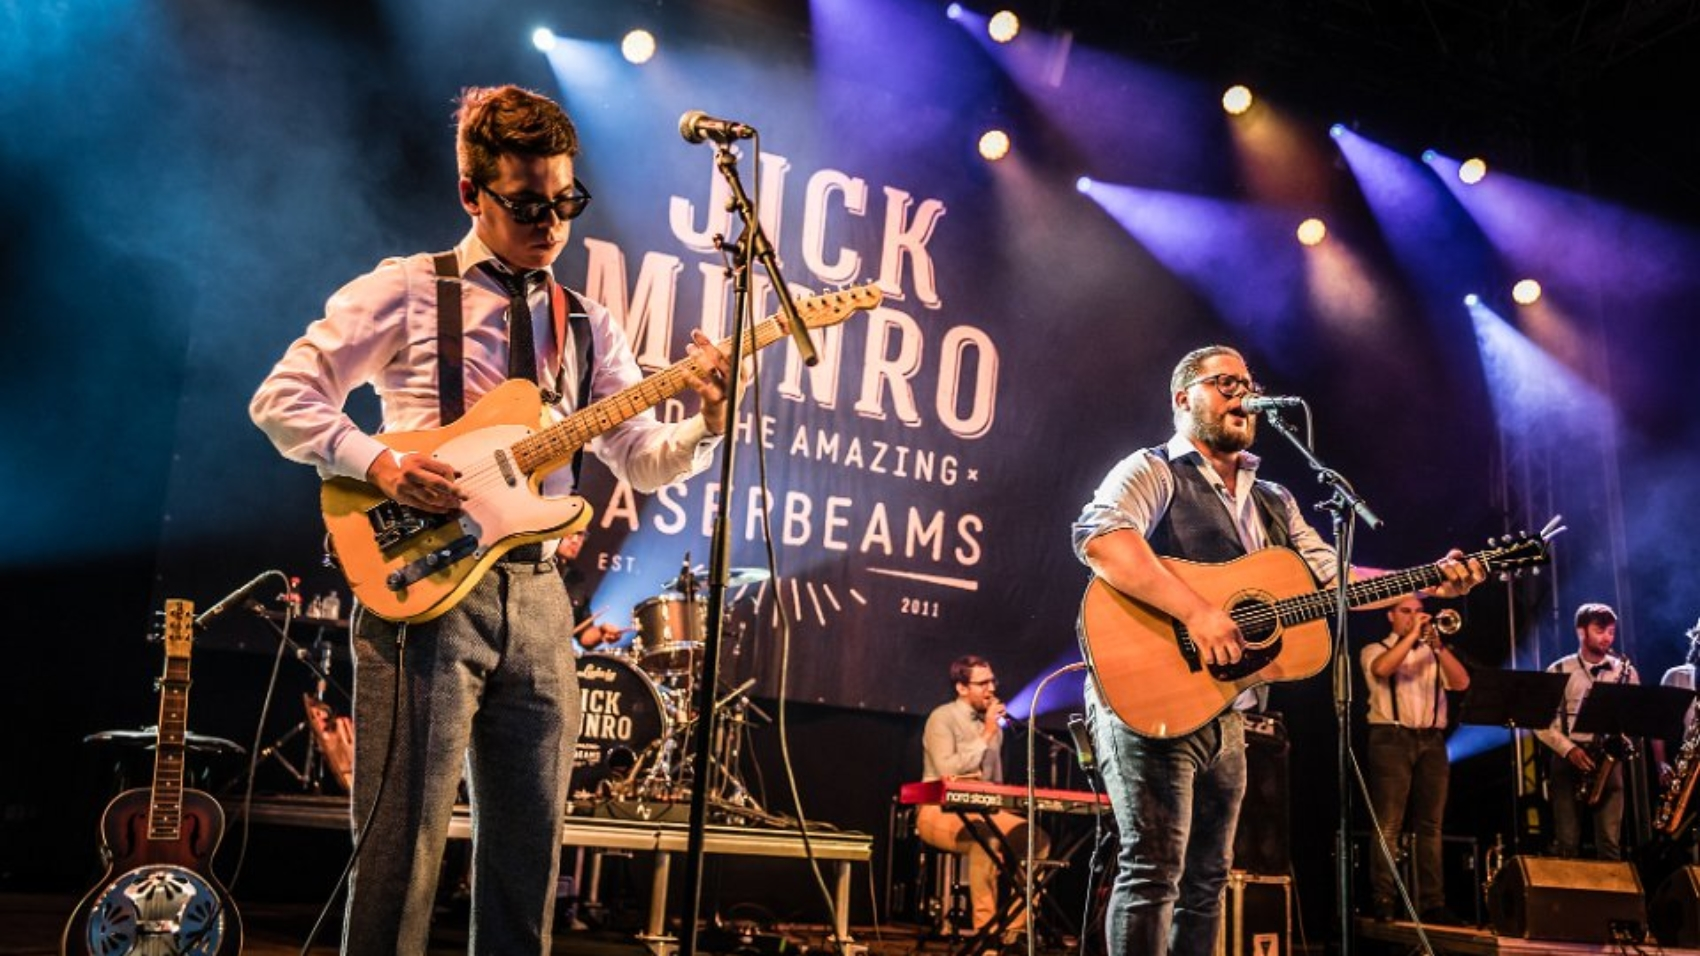 Jick-Munro-and-The-Amazing-Laserbeams-Fonnefeesten-2017-Danny-Wagemans-5